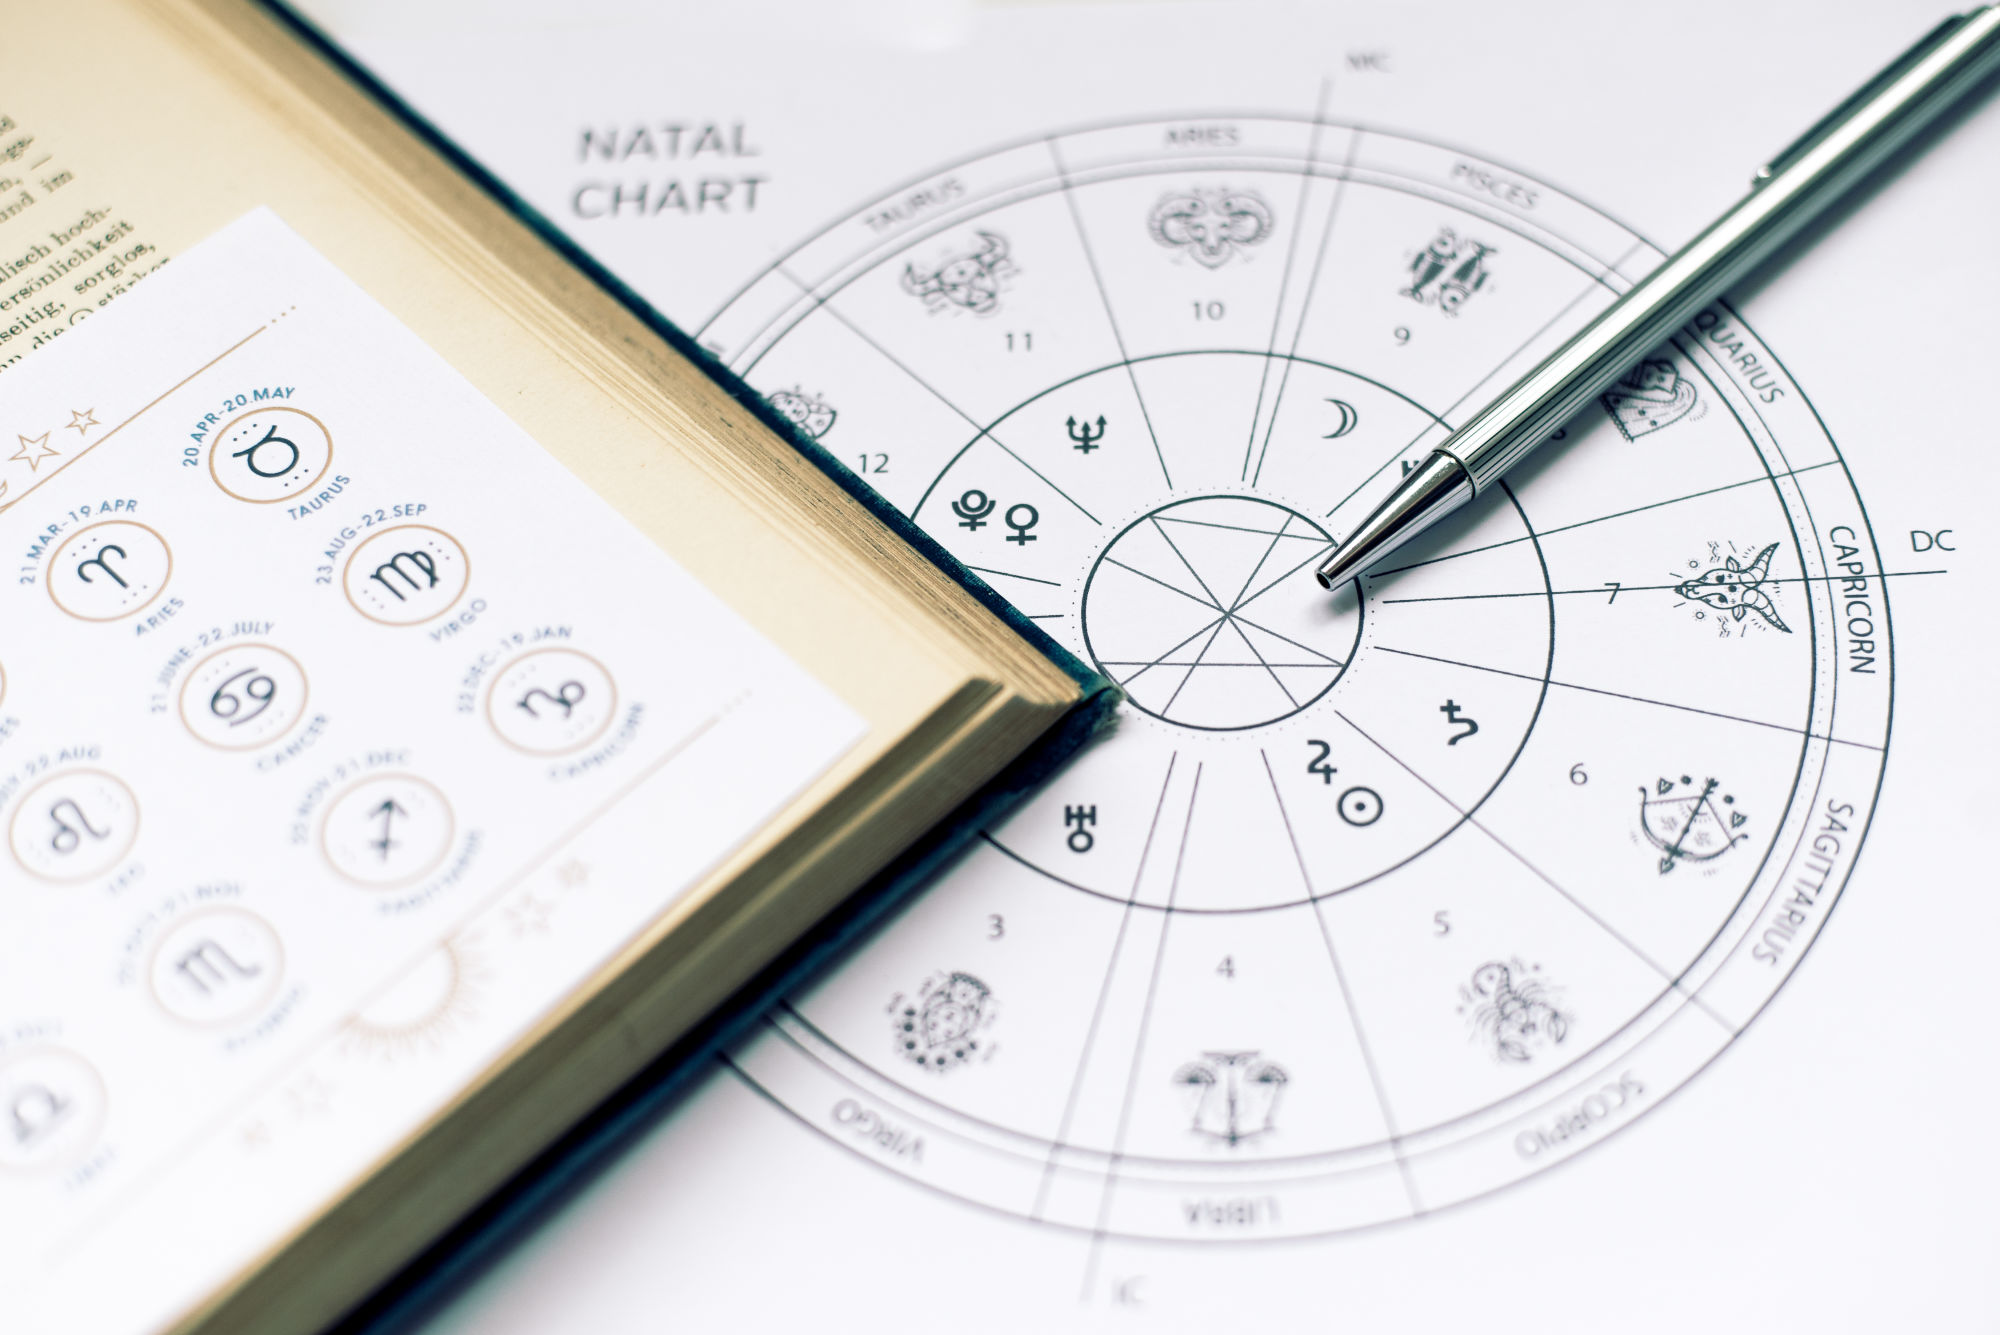 signos del zodiaco, carta astral